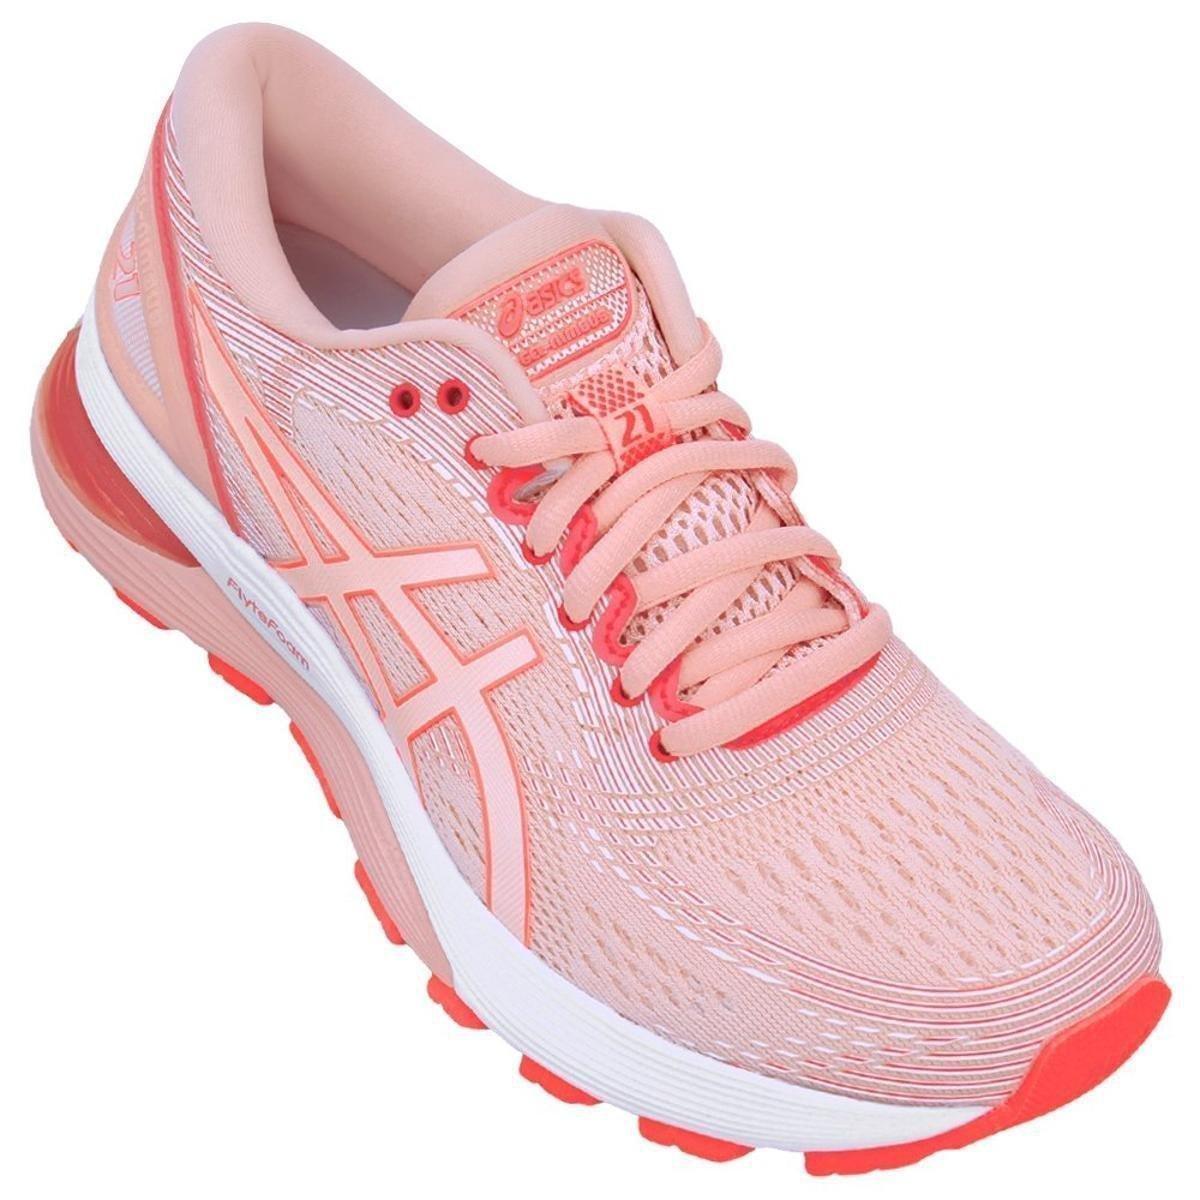 tenis asics feminino roxo e rosa junior 30